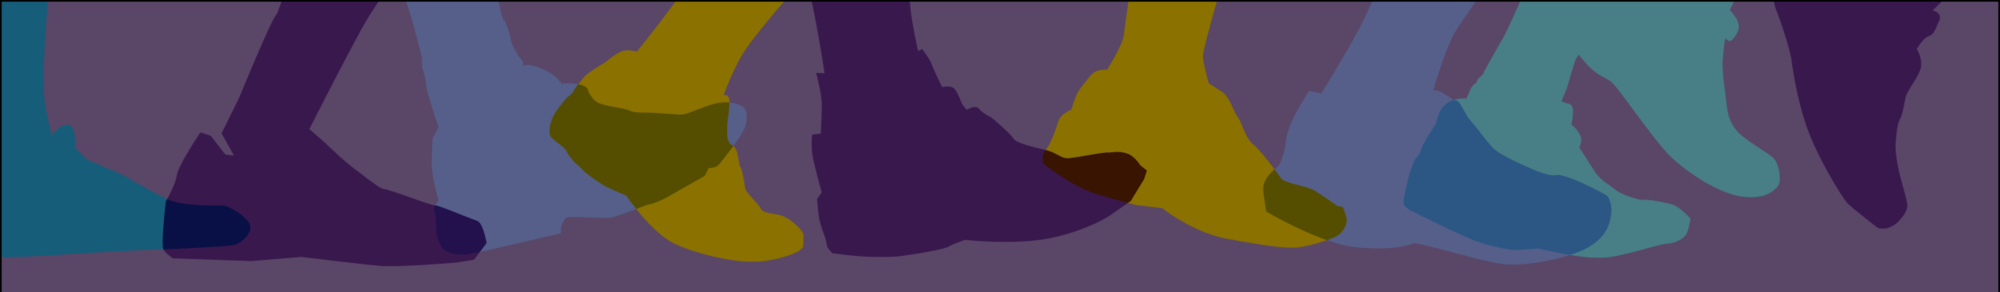 Multi Color Feet Header.png